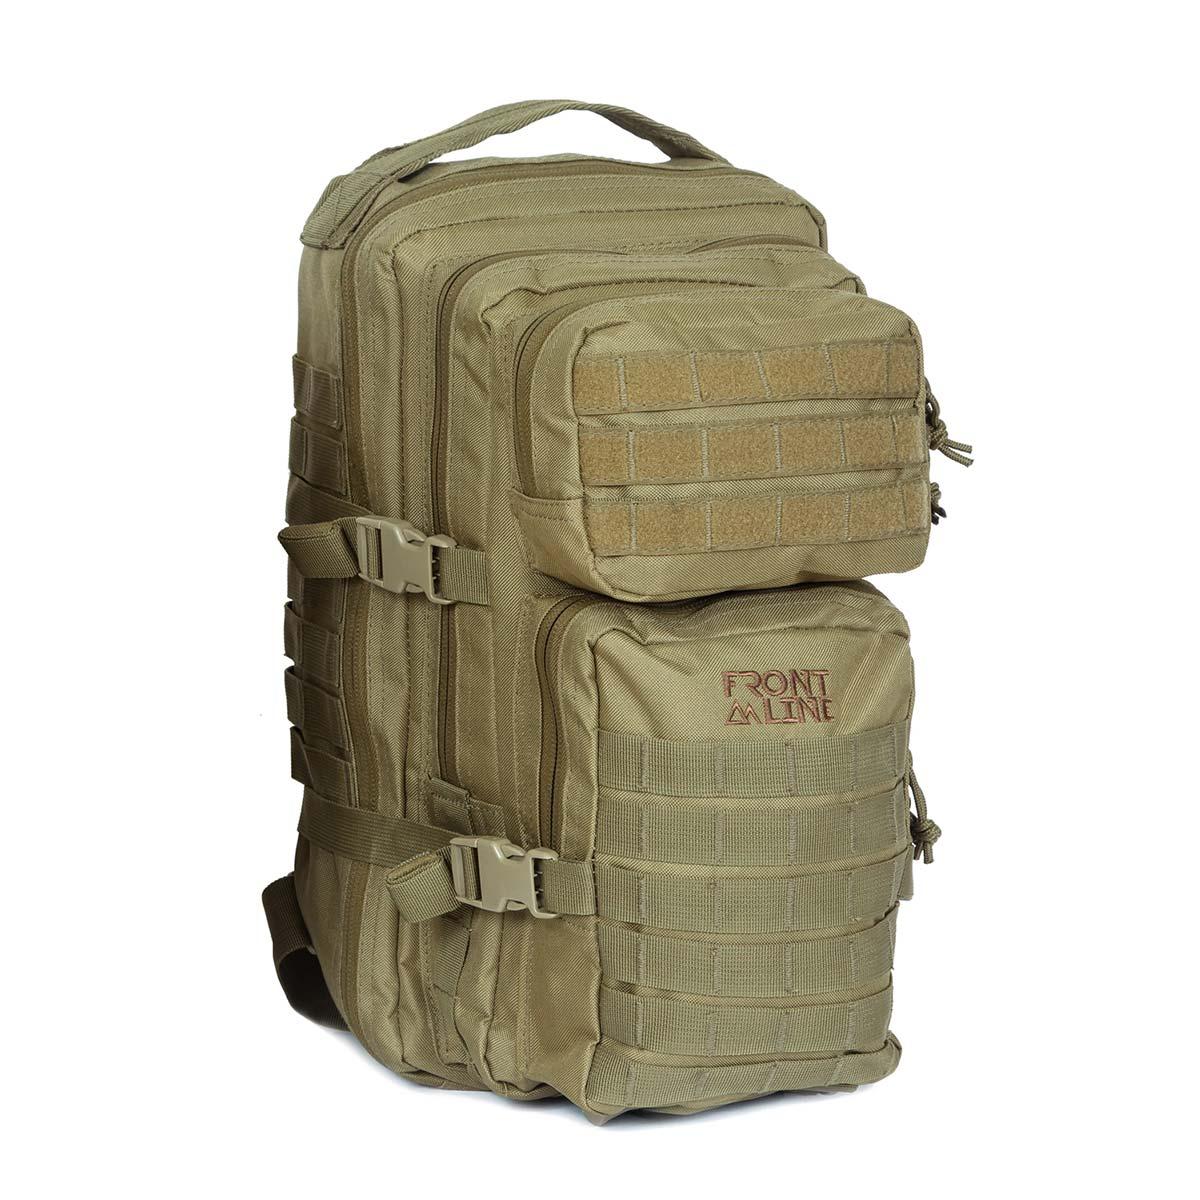 Front-Line-Tavor-2-Tactical-Backpack---Tan-1